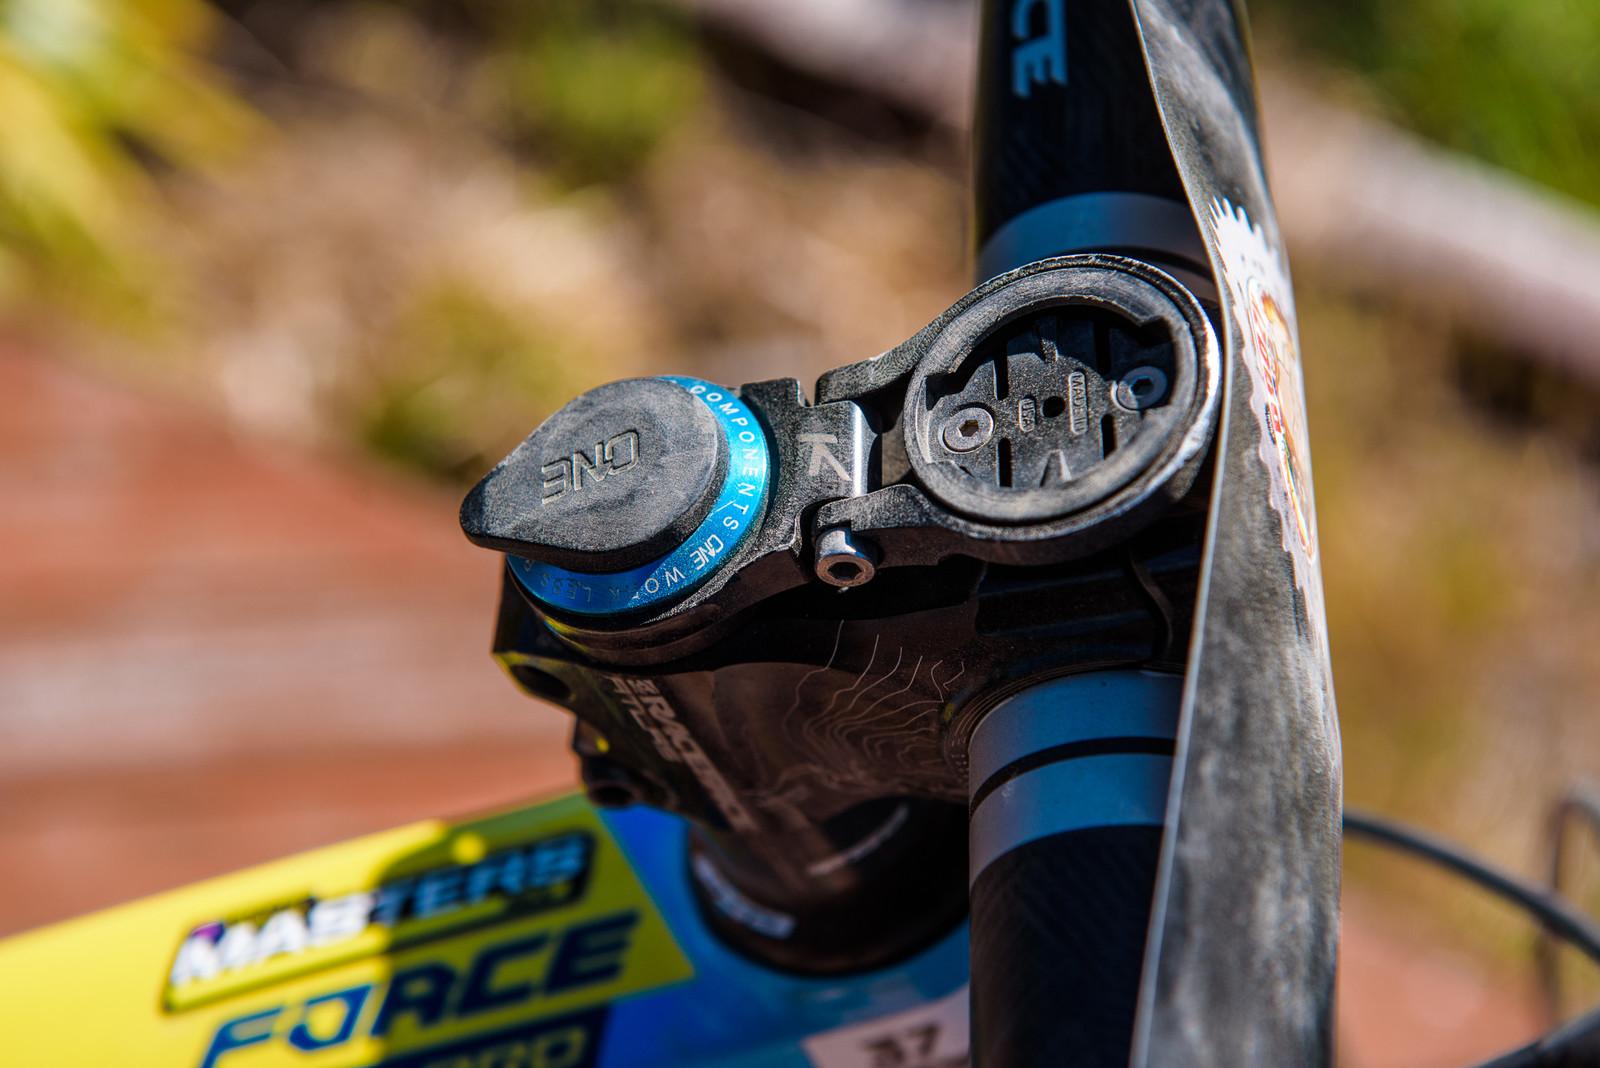 OneUp EDC Top Cap - Pro Bike - Wyn Masters' GT Force, Size XL - Mountain Biking Pictures - Vital MTB